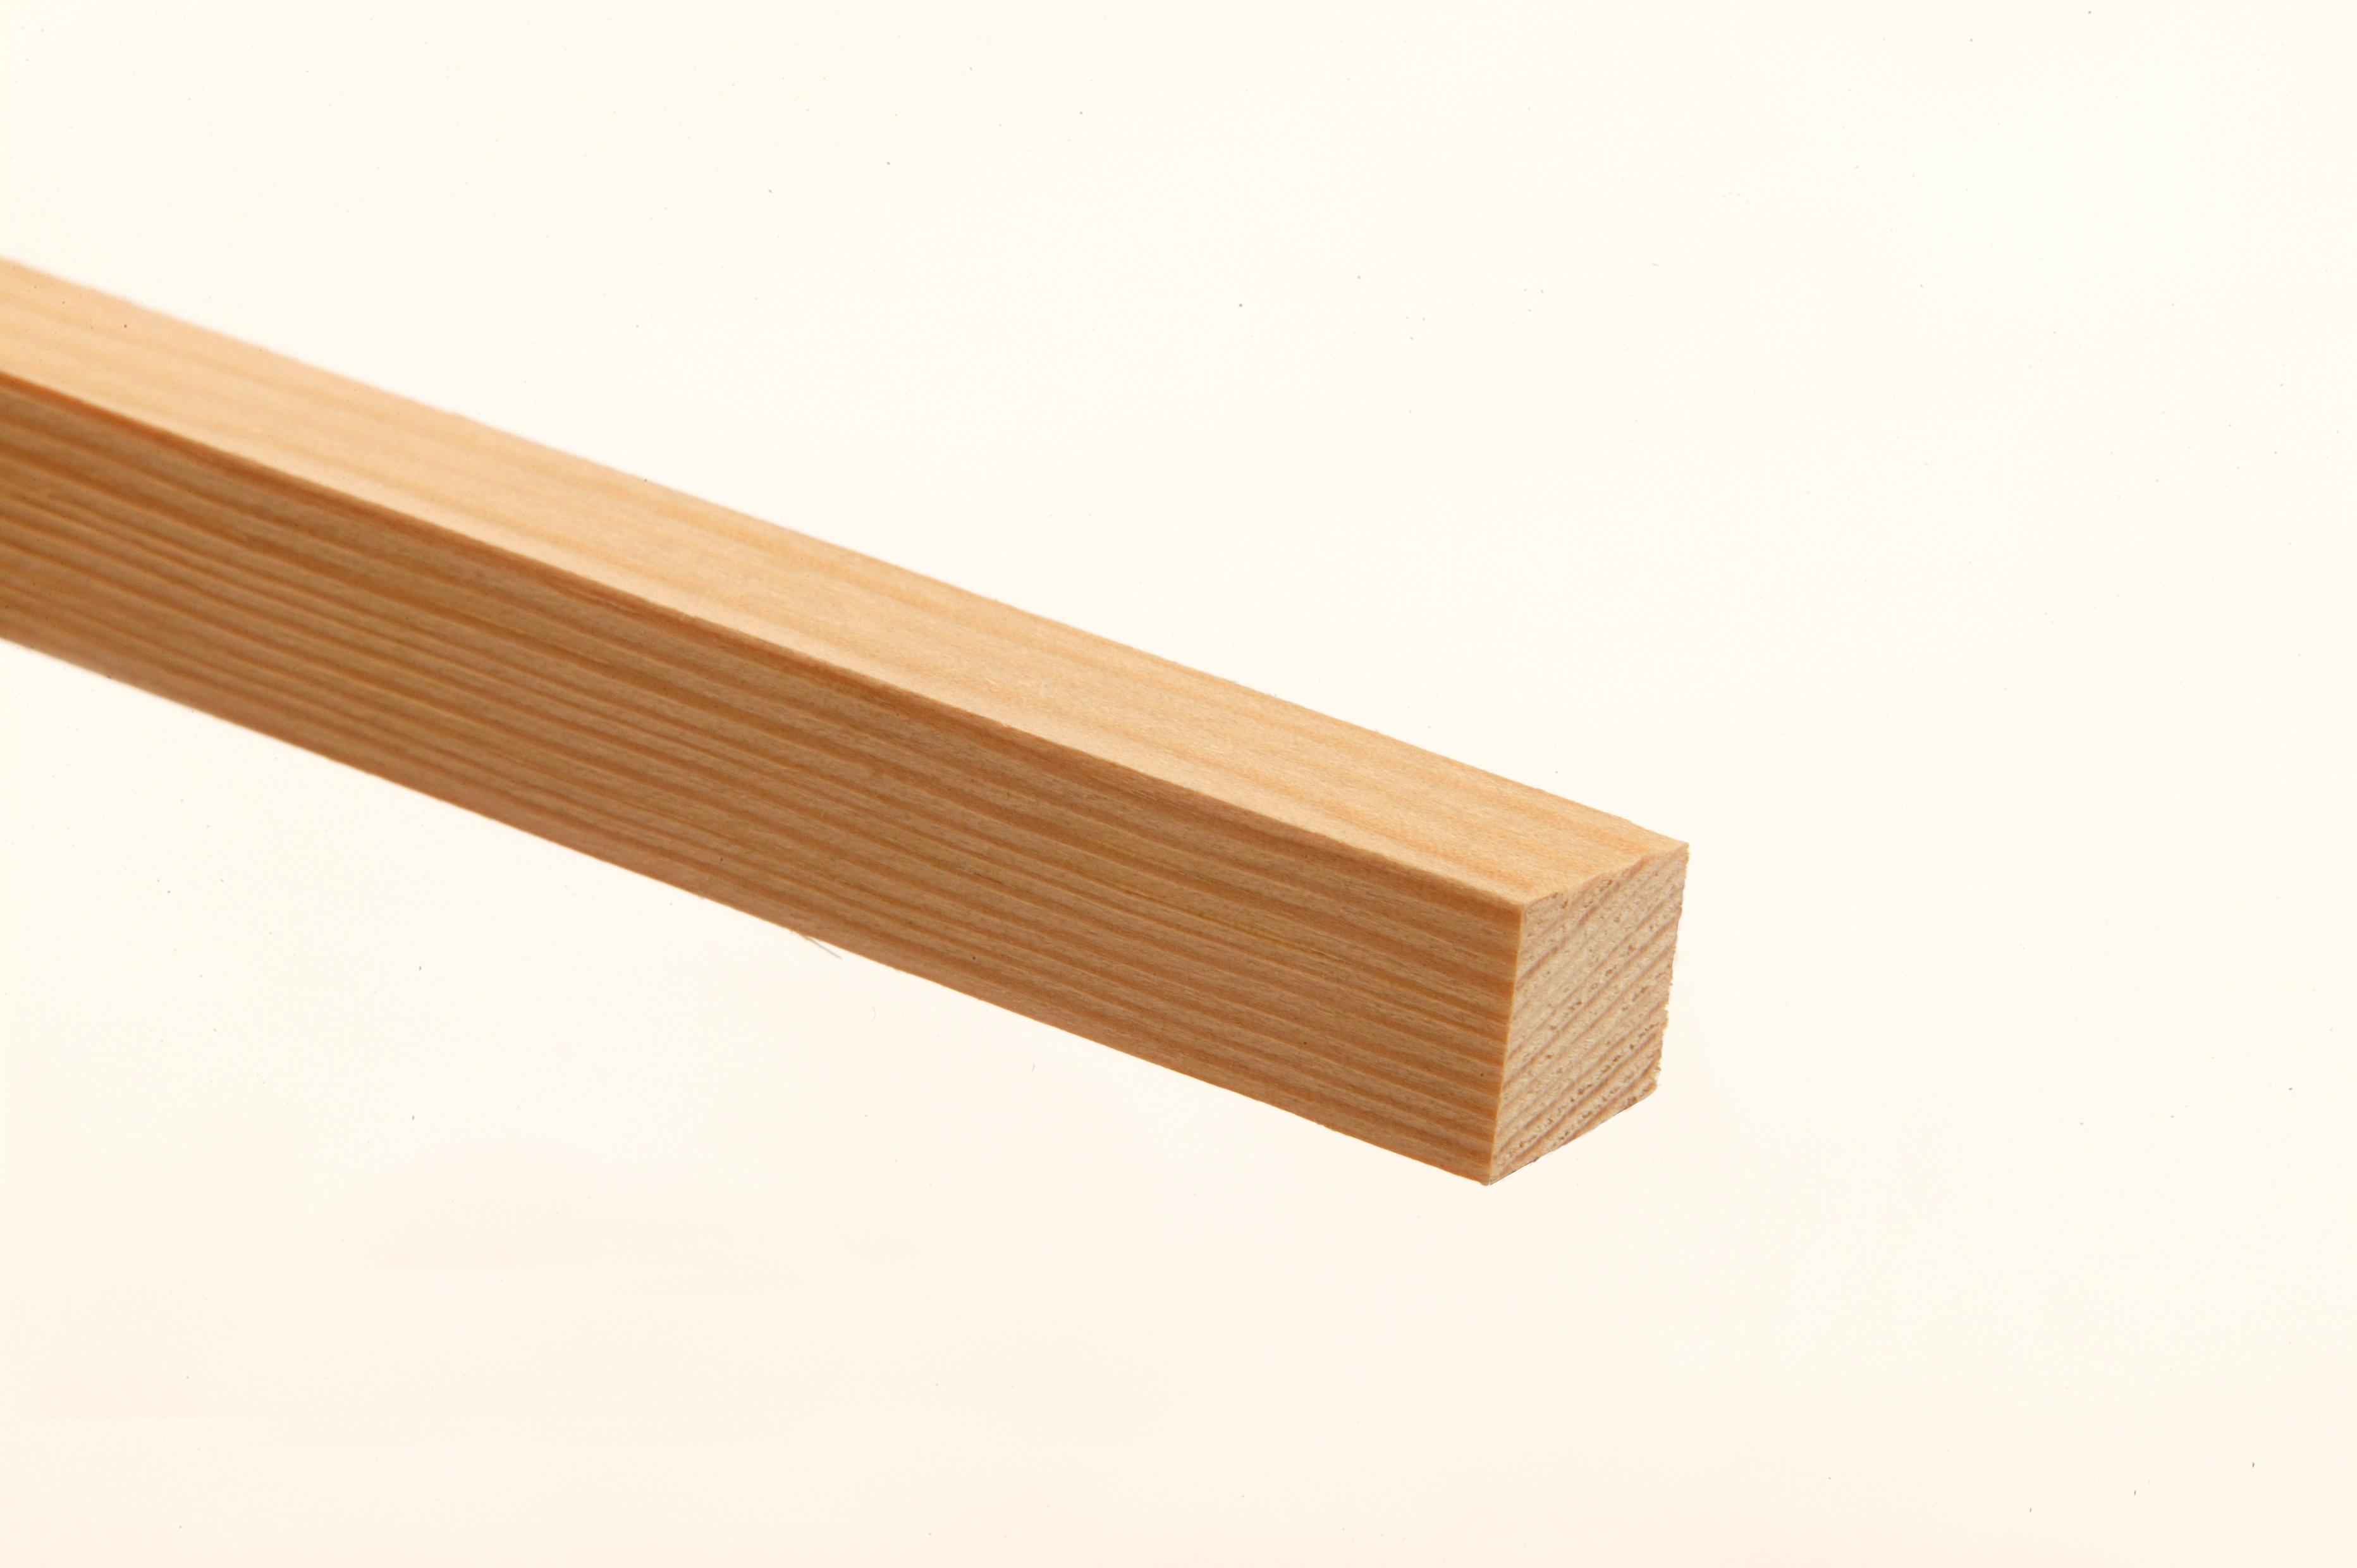 20 Pine PSE Stripwood 12 x 12 x 2400mm